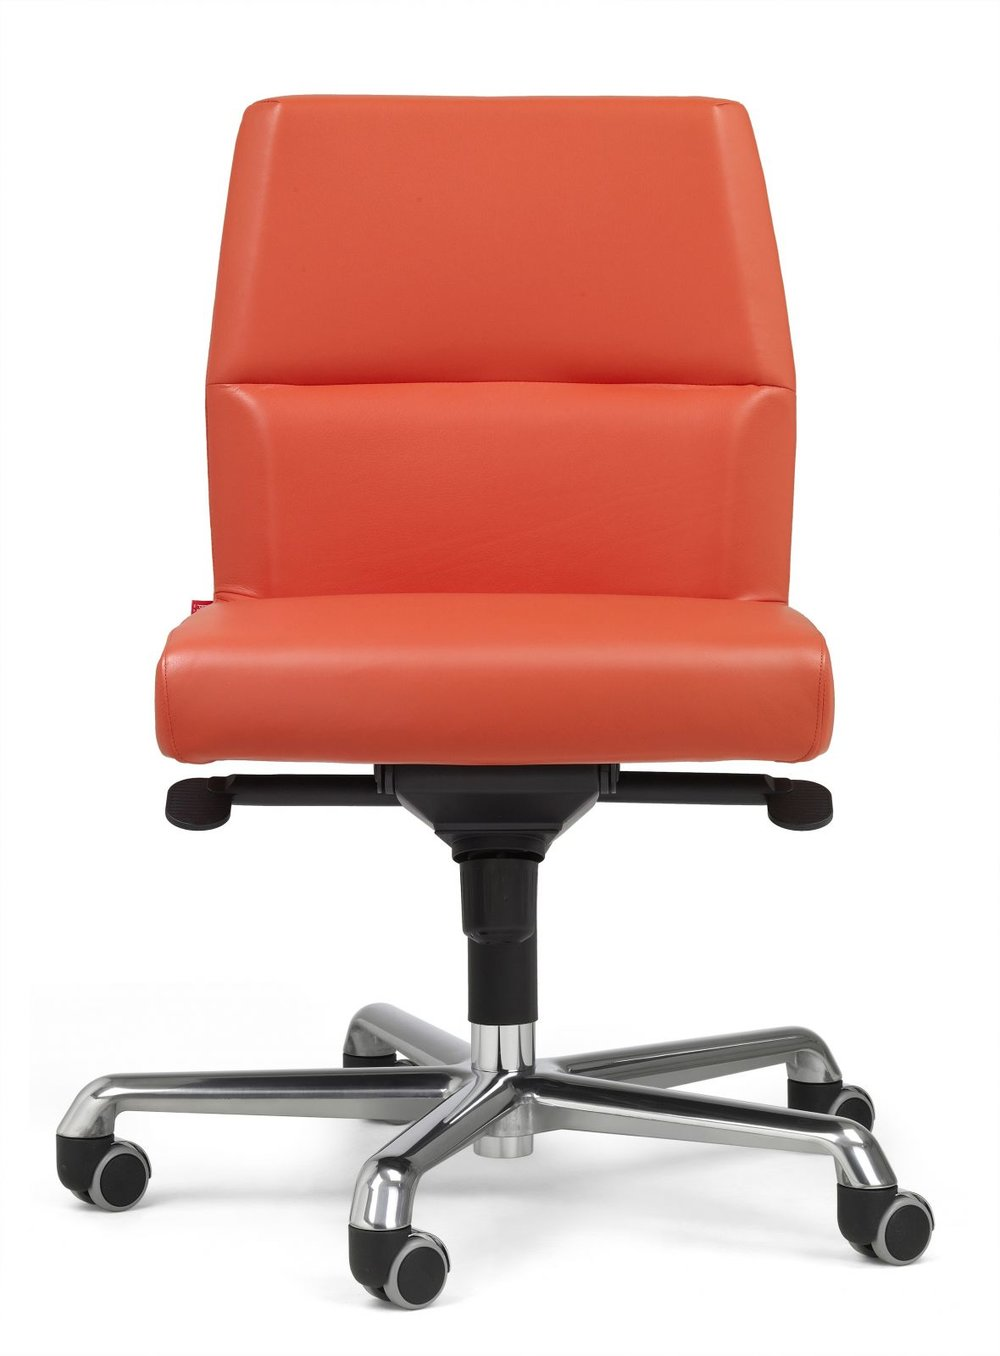 modern-office-chairs-Italian-furniture-designer-chairs (26).jpg